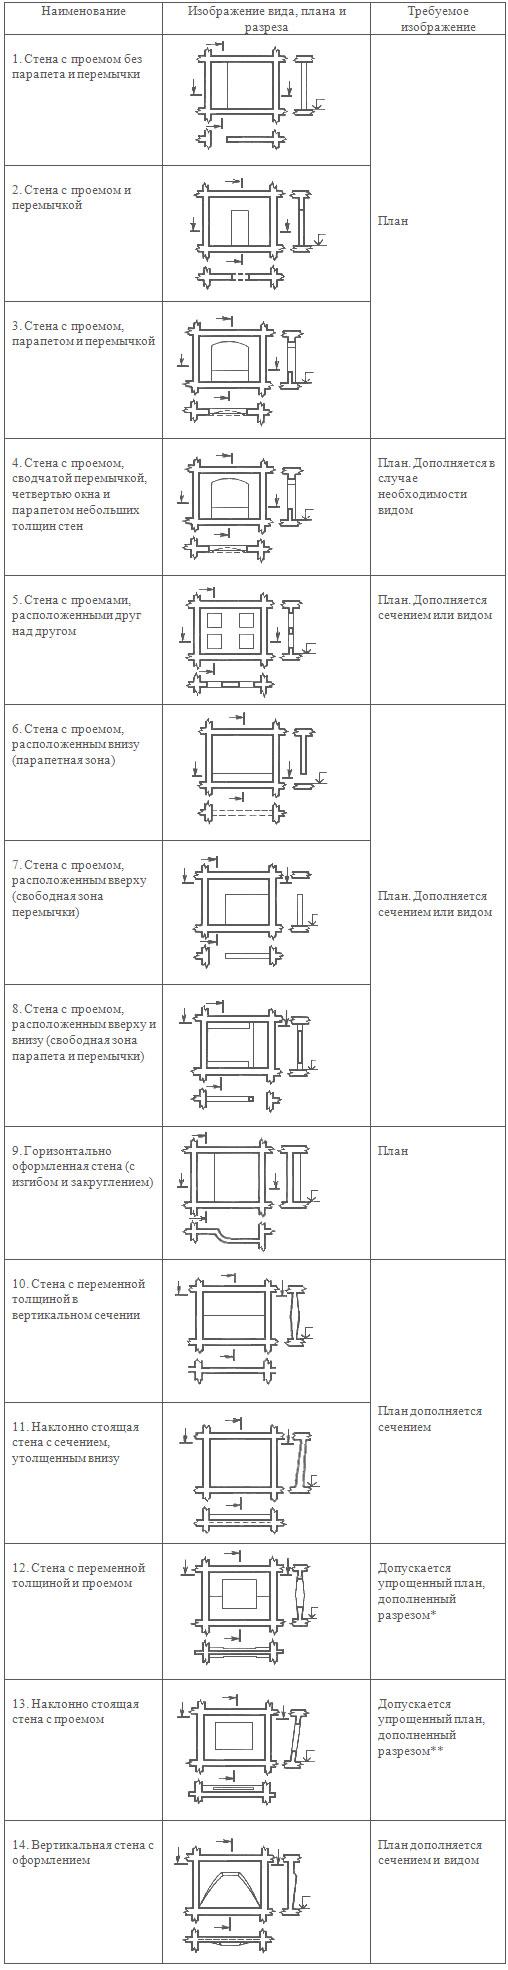 Правила изображения стен в масштабах 1:100 и 1:50